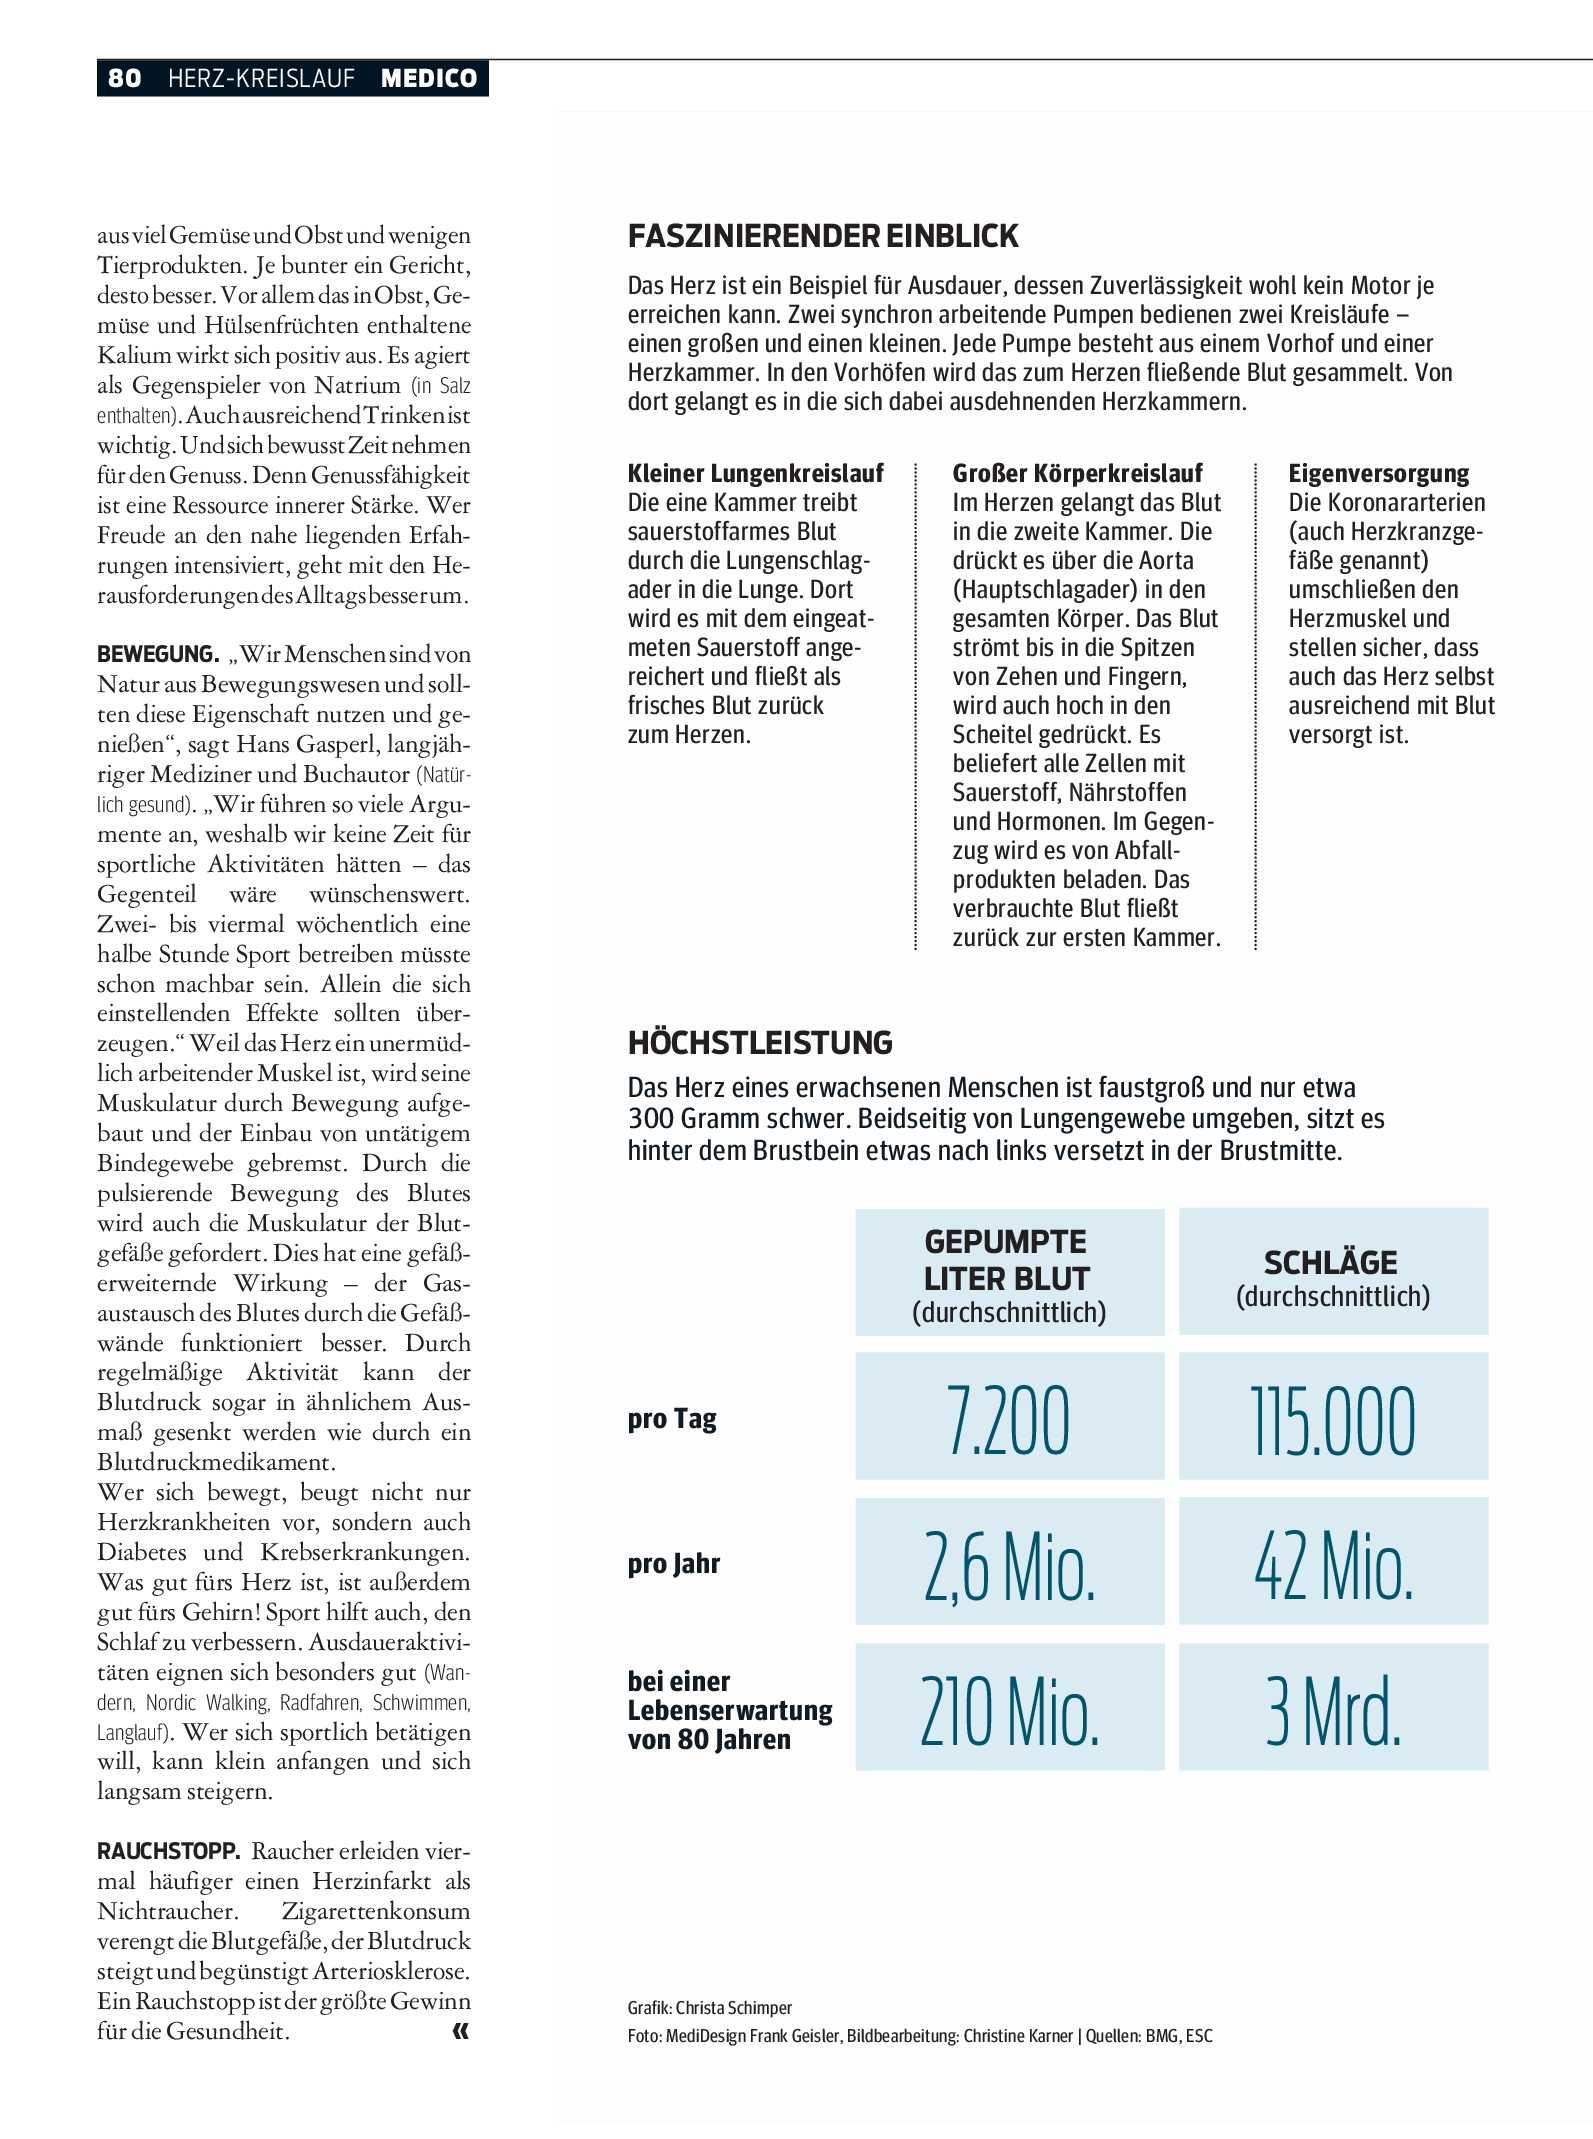 public/epaper/imported/20201125/kurier/magazin/magazin_20201125_080.jpg